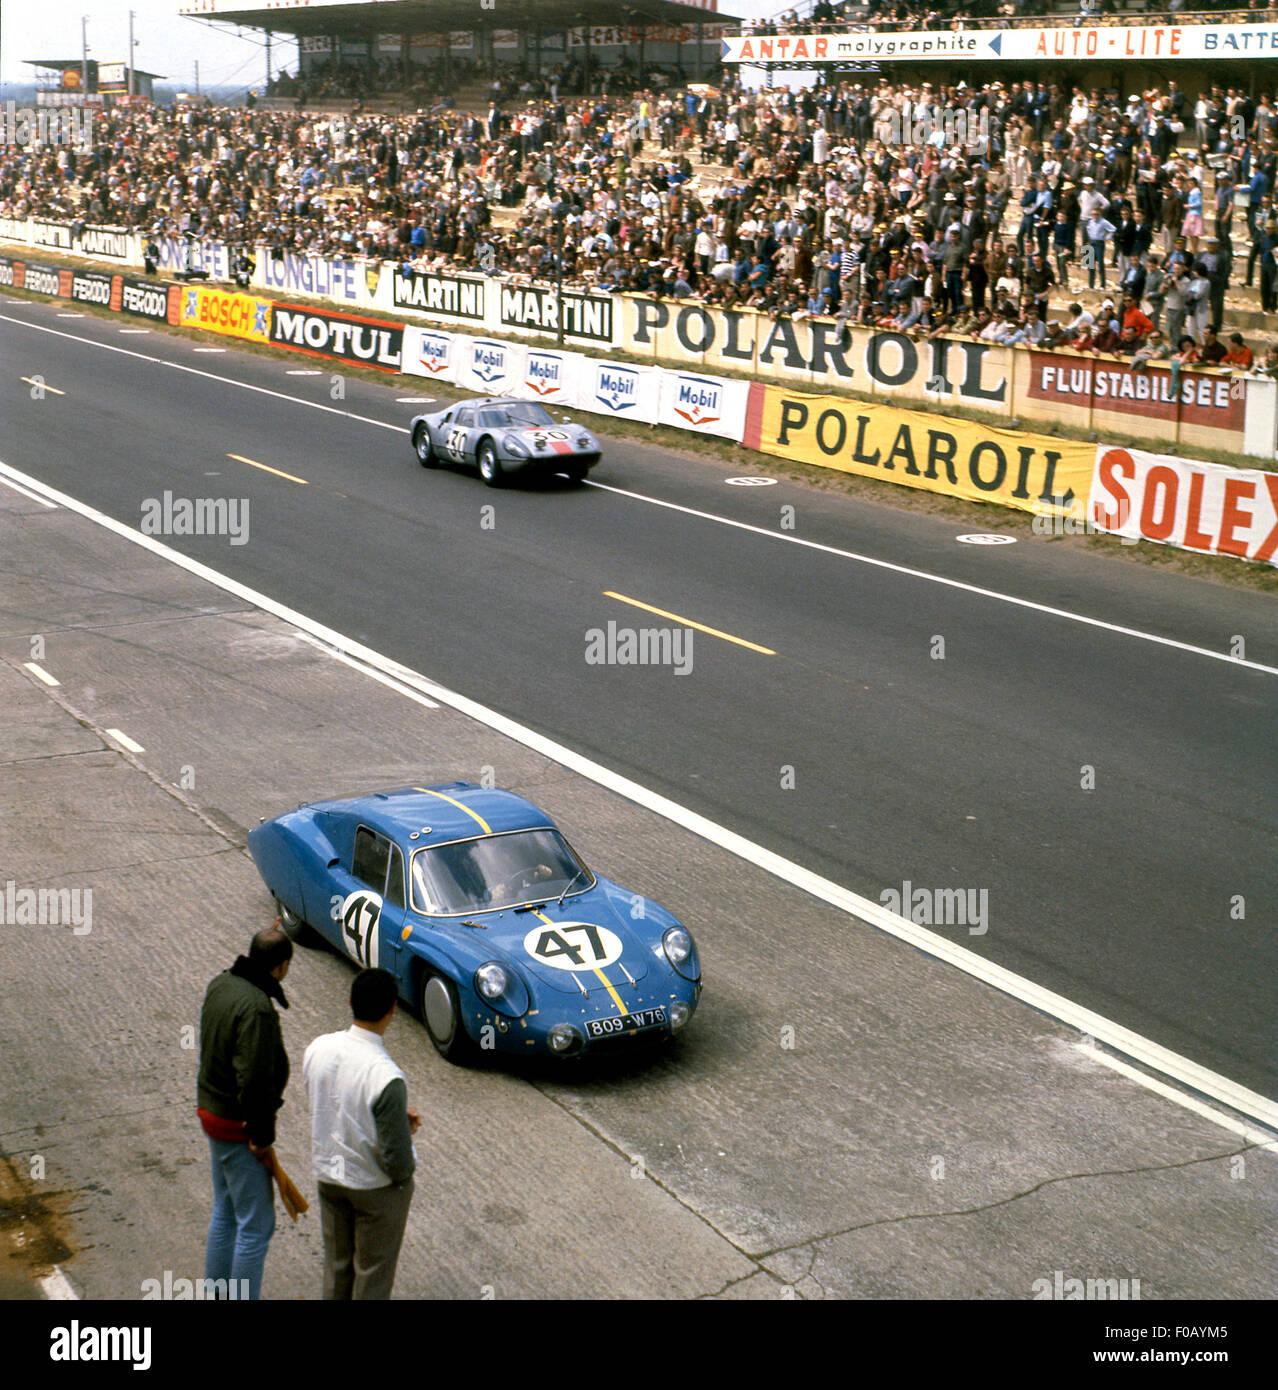 Car Dashboard Wallpaper Le Mans 24 Hours 1964 No 47 Mauro Bianchi Jean Vinatier